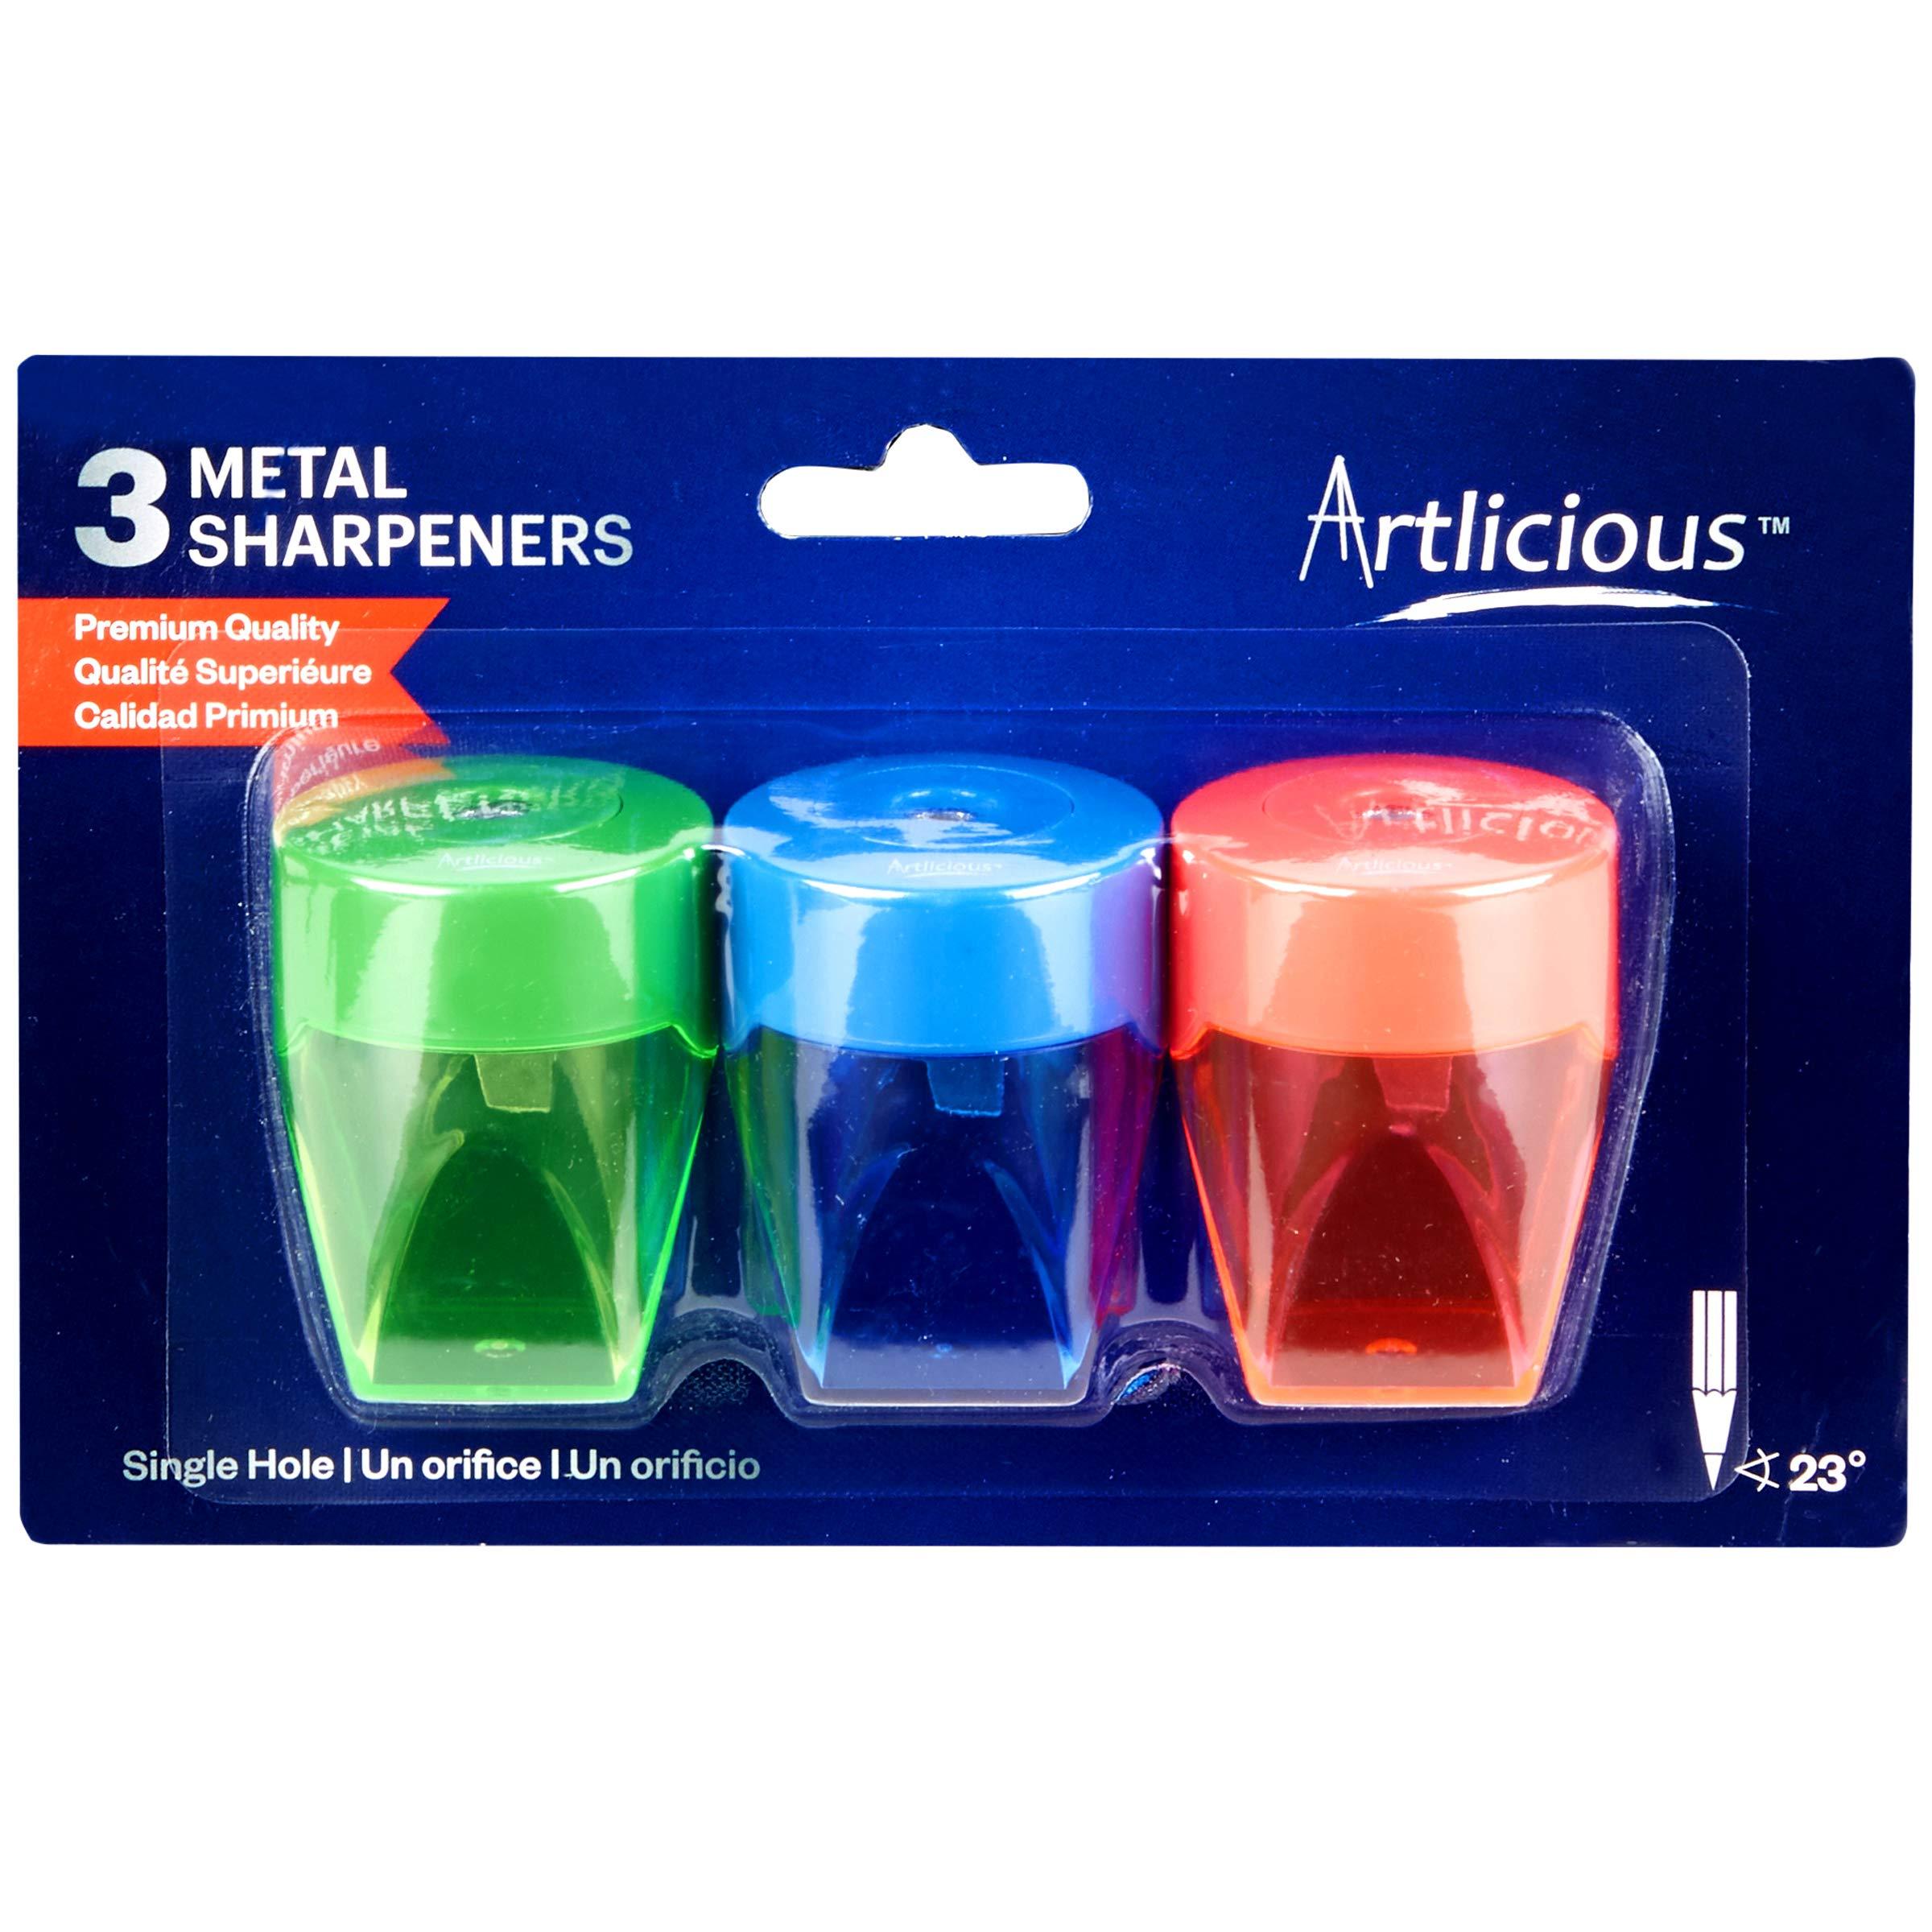 Artlicious 3 Colorful Compact Metal Pencil Sharpener Value Pack - Colored Pencils, Watercolor Pencils, School Pencils by Sorillo Brands (Image #2)